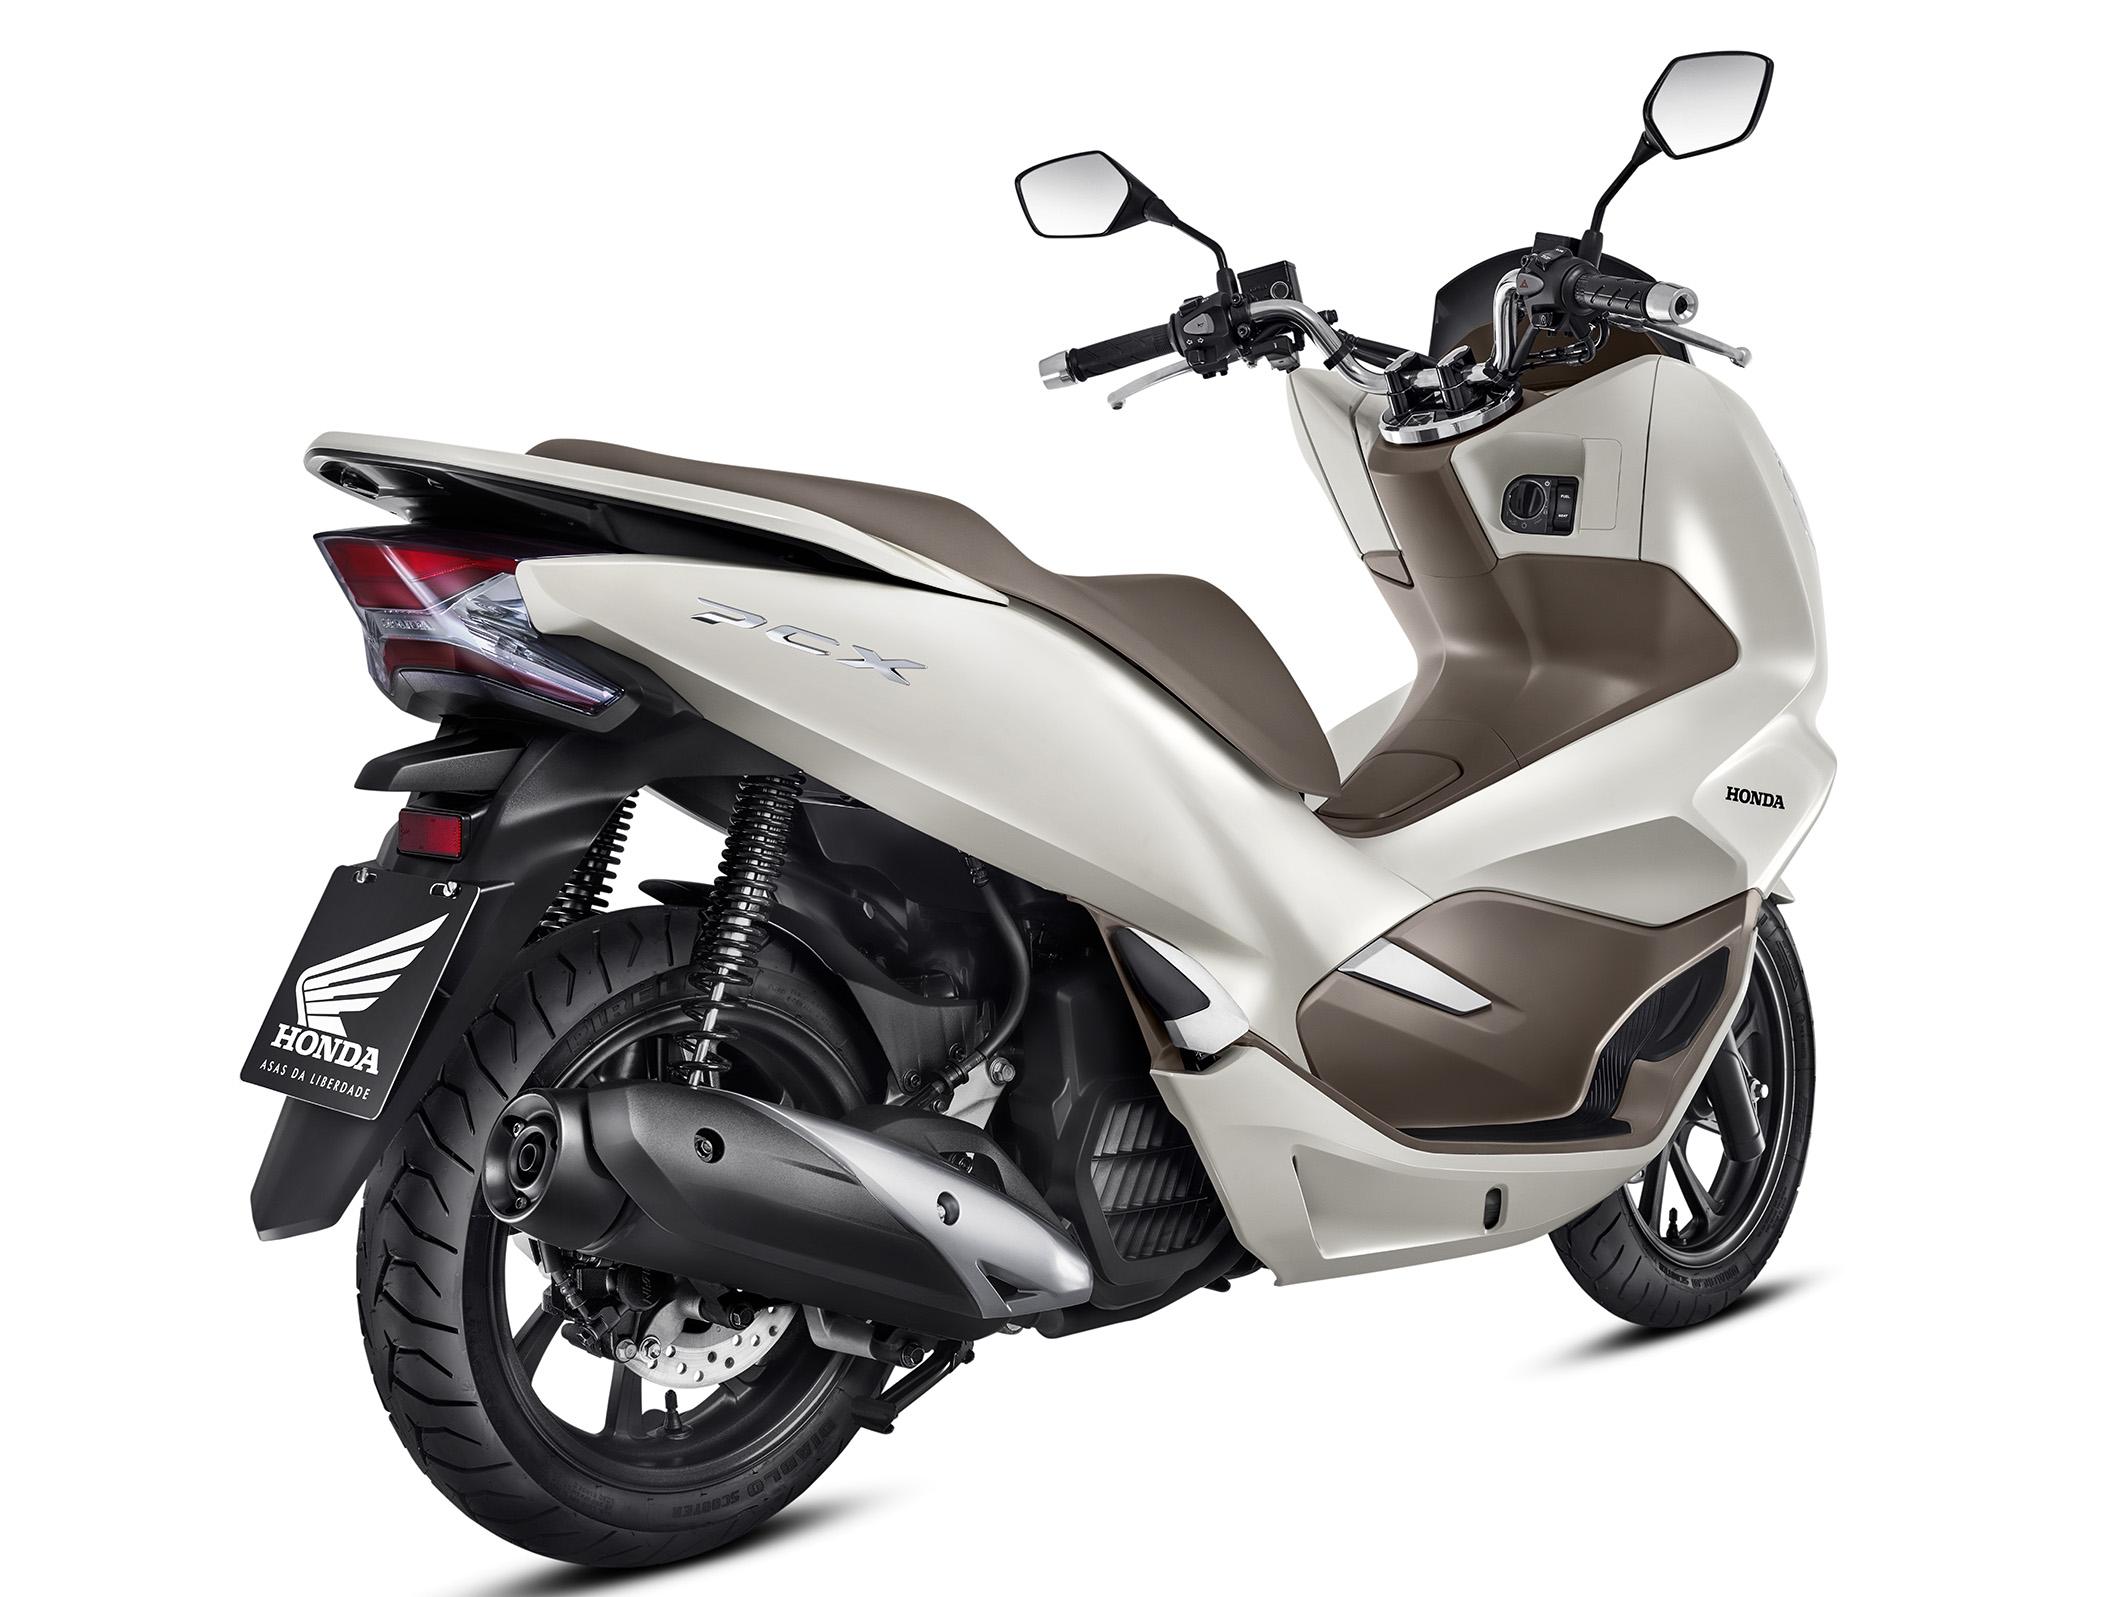 653scooter Honda Pcx150 Dlx2 2019122151650